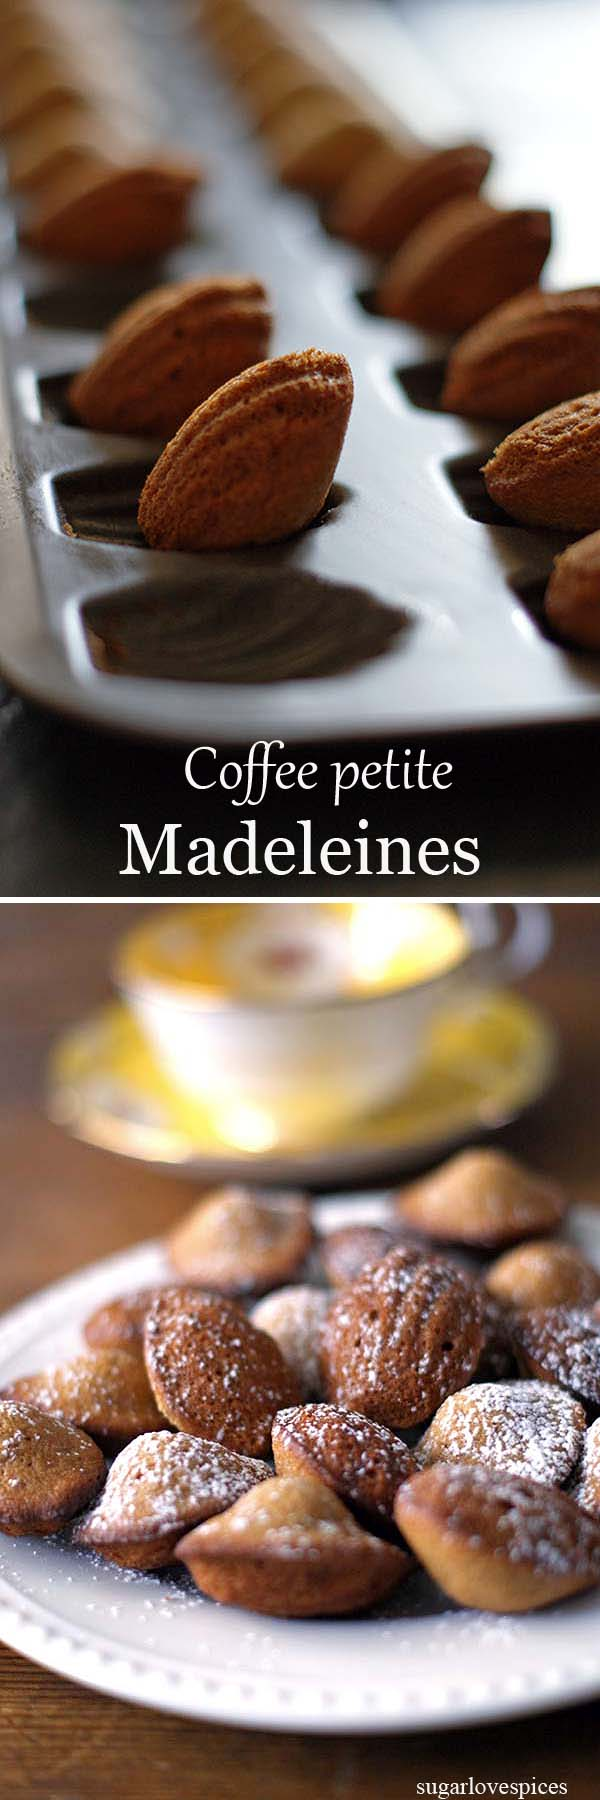 Coffee-petite-madeleines